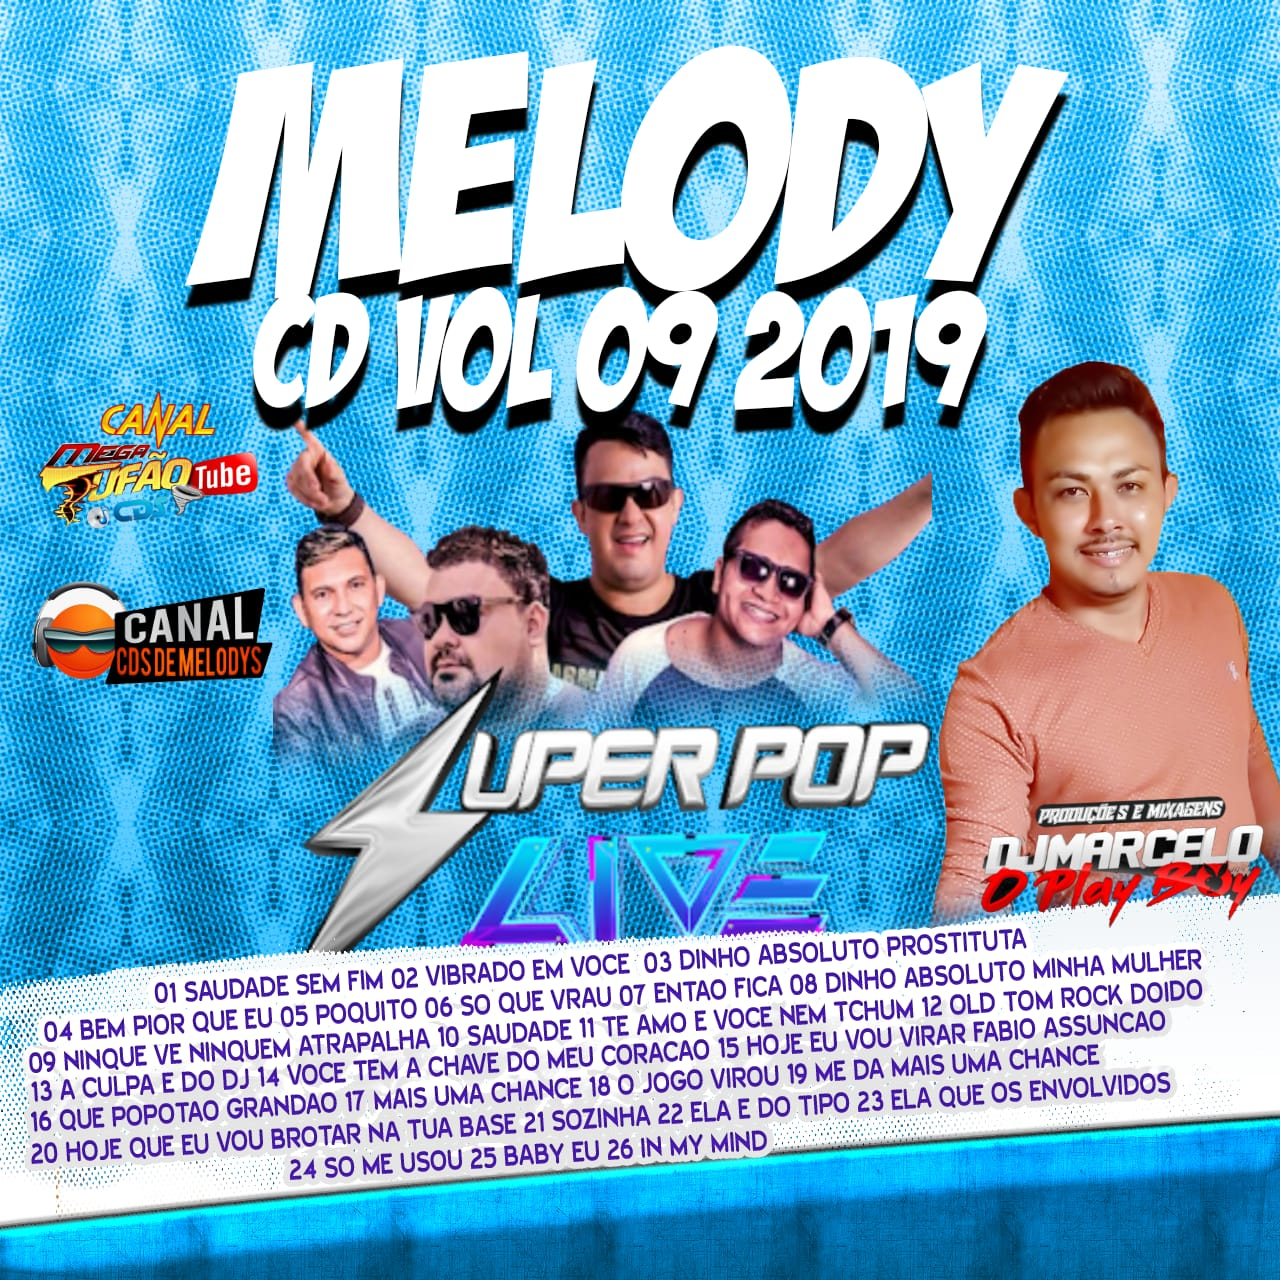 MUSICAS VOL.3 CD SUPERPOP BAIXAR DO